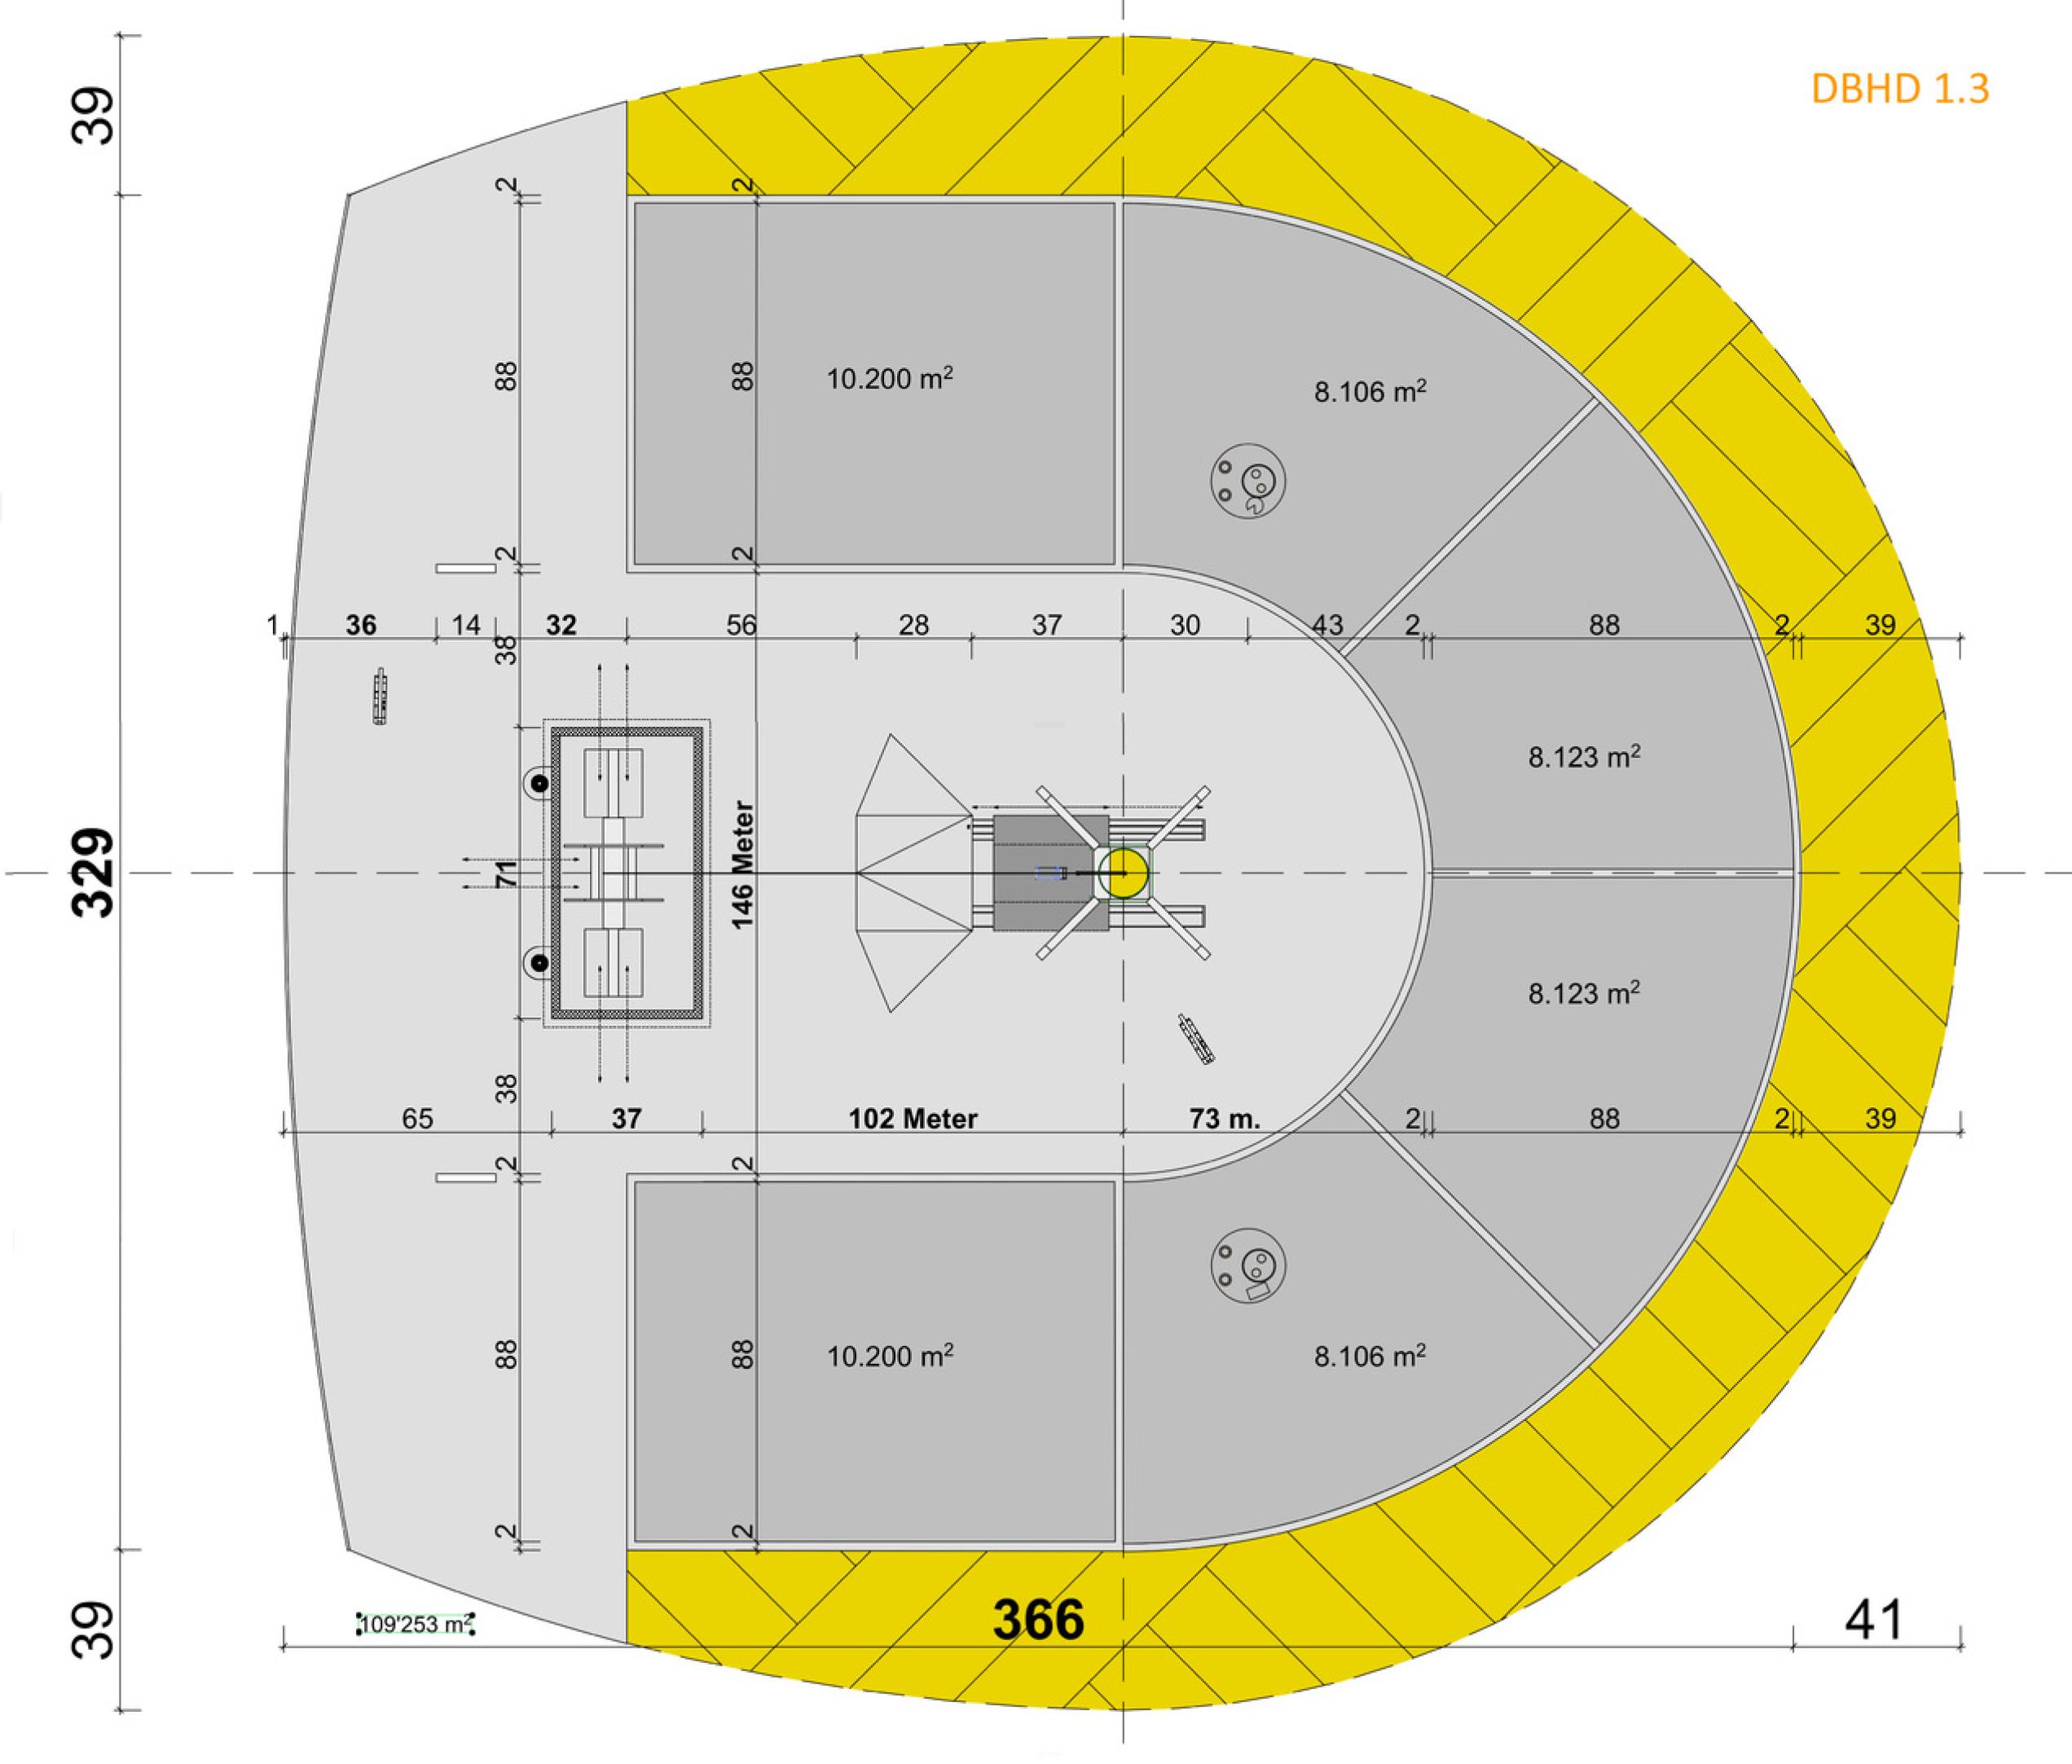 DBHD_1.3_Grundriss_Floorplan_Surface_Oberfläche_Endlager_M-V._BFE_BGE_Ing_Goebel_Fachplanerjpg